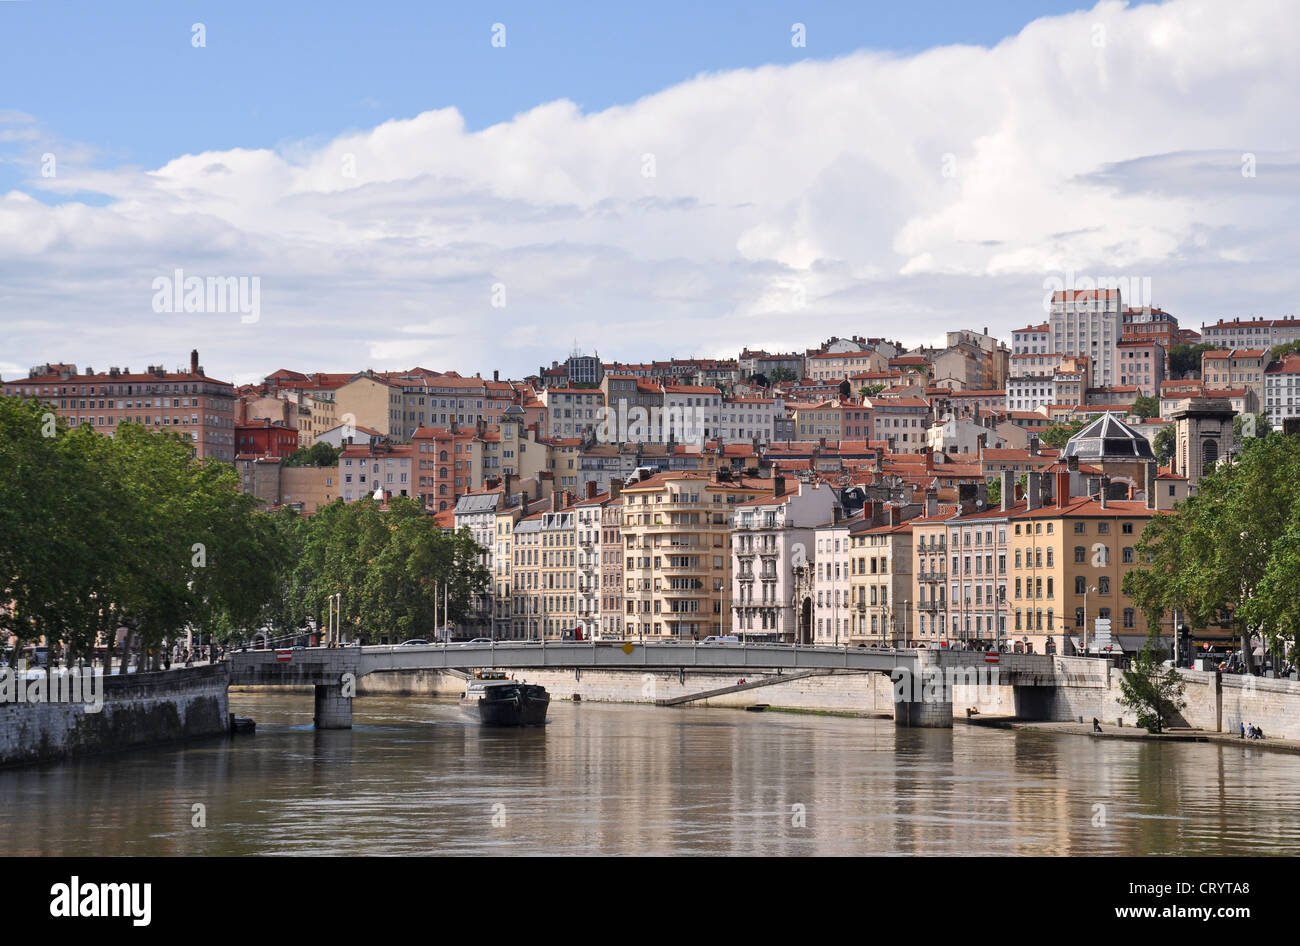 Old city quarter, Lyon, France - Stock Image